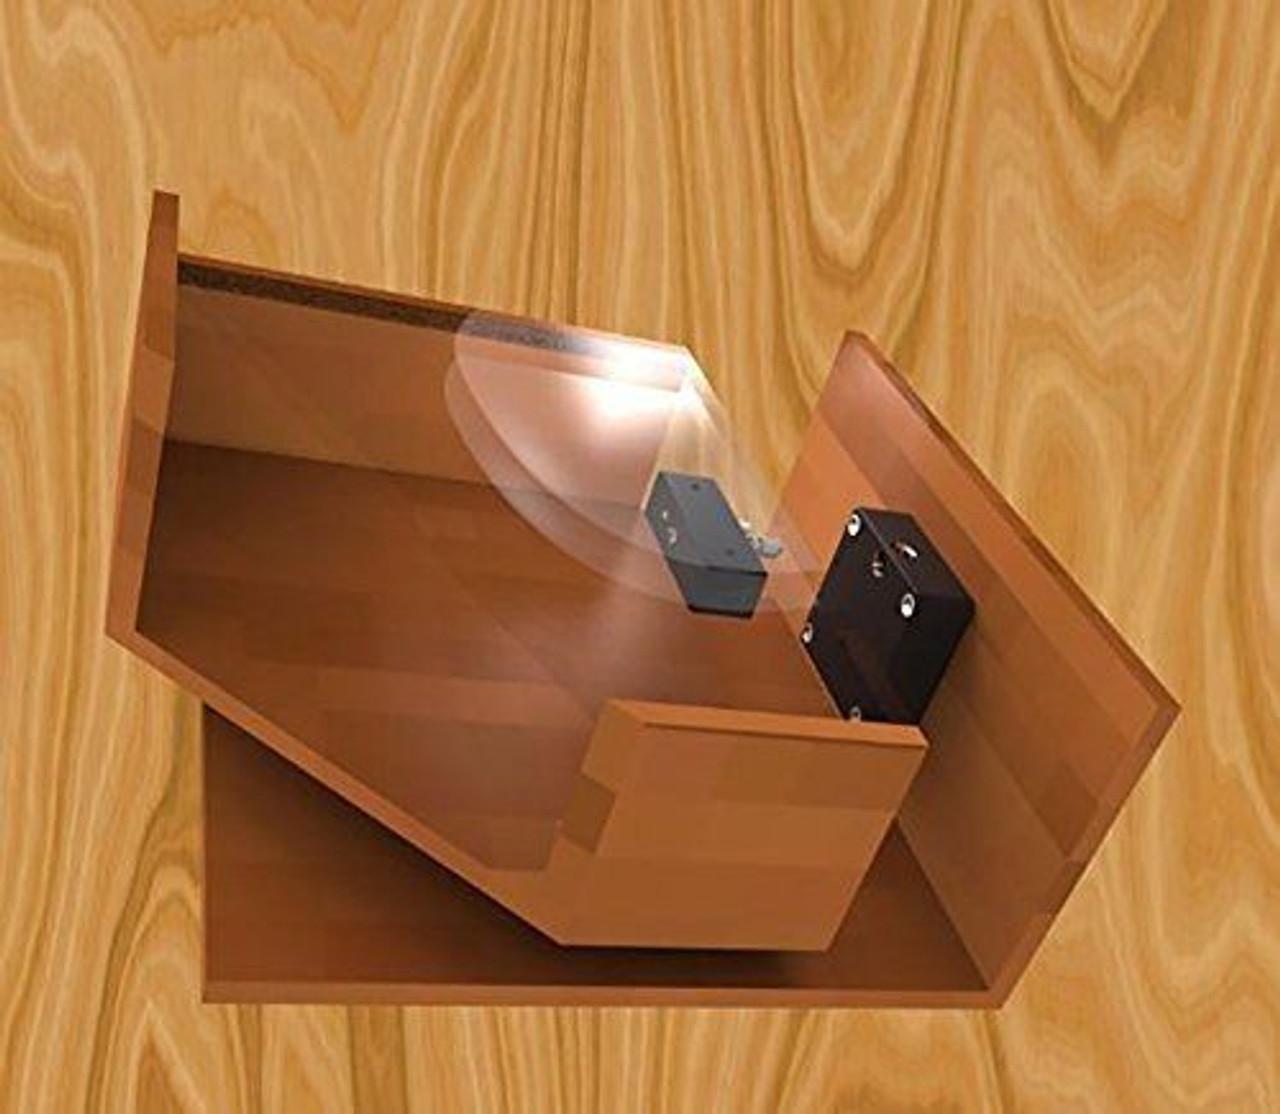 Bluetooth / Fingerprint Round Cabinet Drawer Lock, with AC port